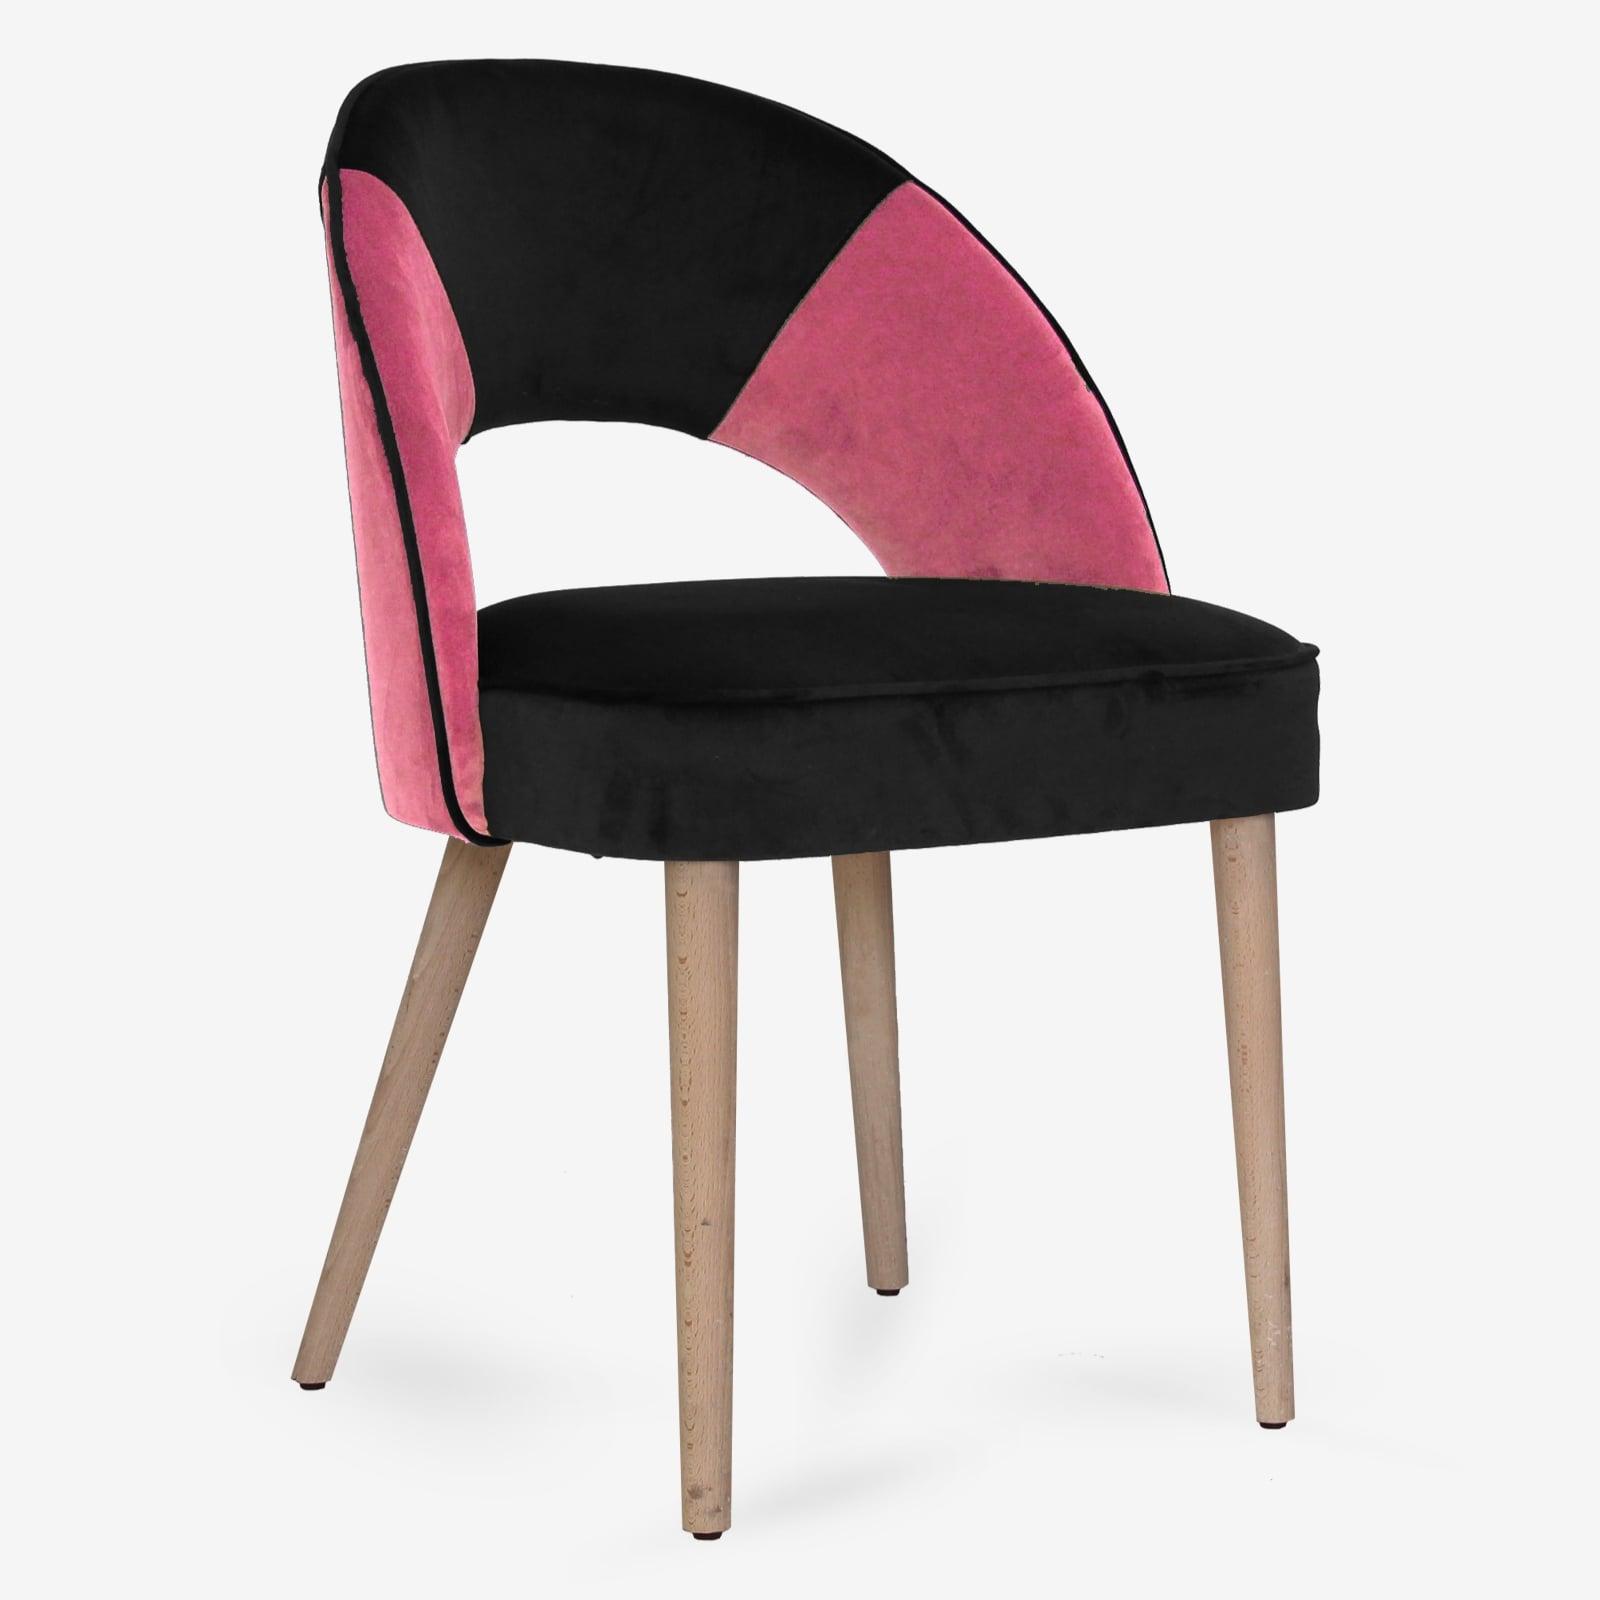 Sedie-in-velluto-sedie-vintage-sedie-di-design-sedie-per-arredamento-contract-sedie-per-ristoranti-alberghi-agriturismi-uffici-negozi-rosa-l